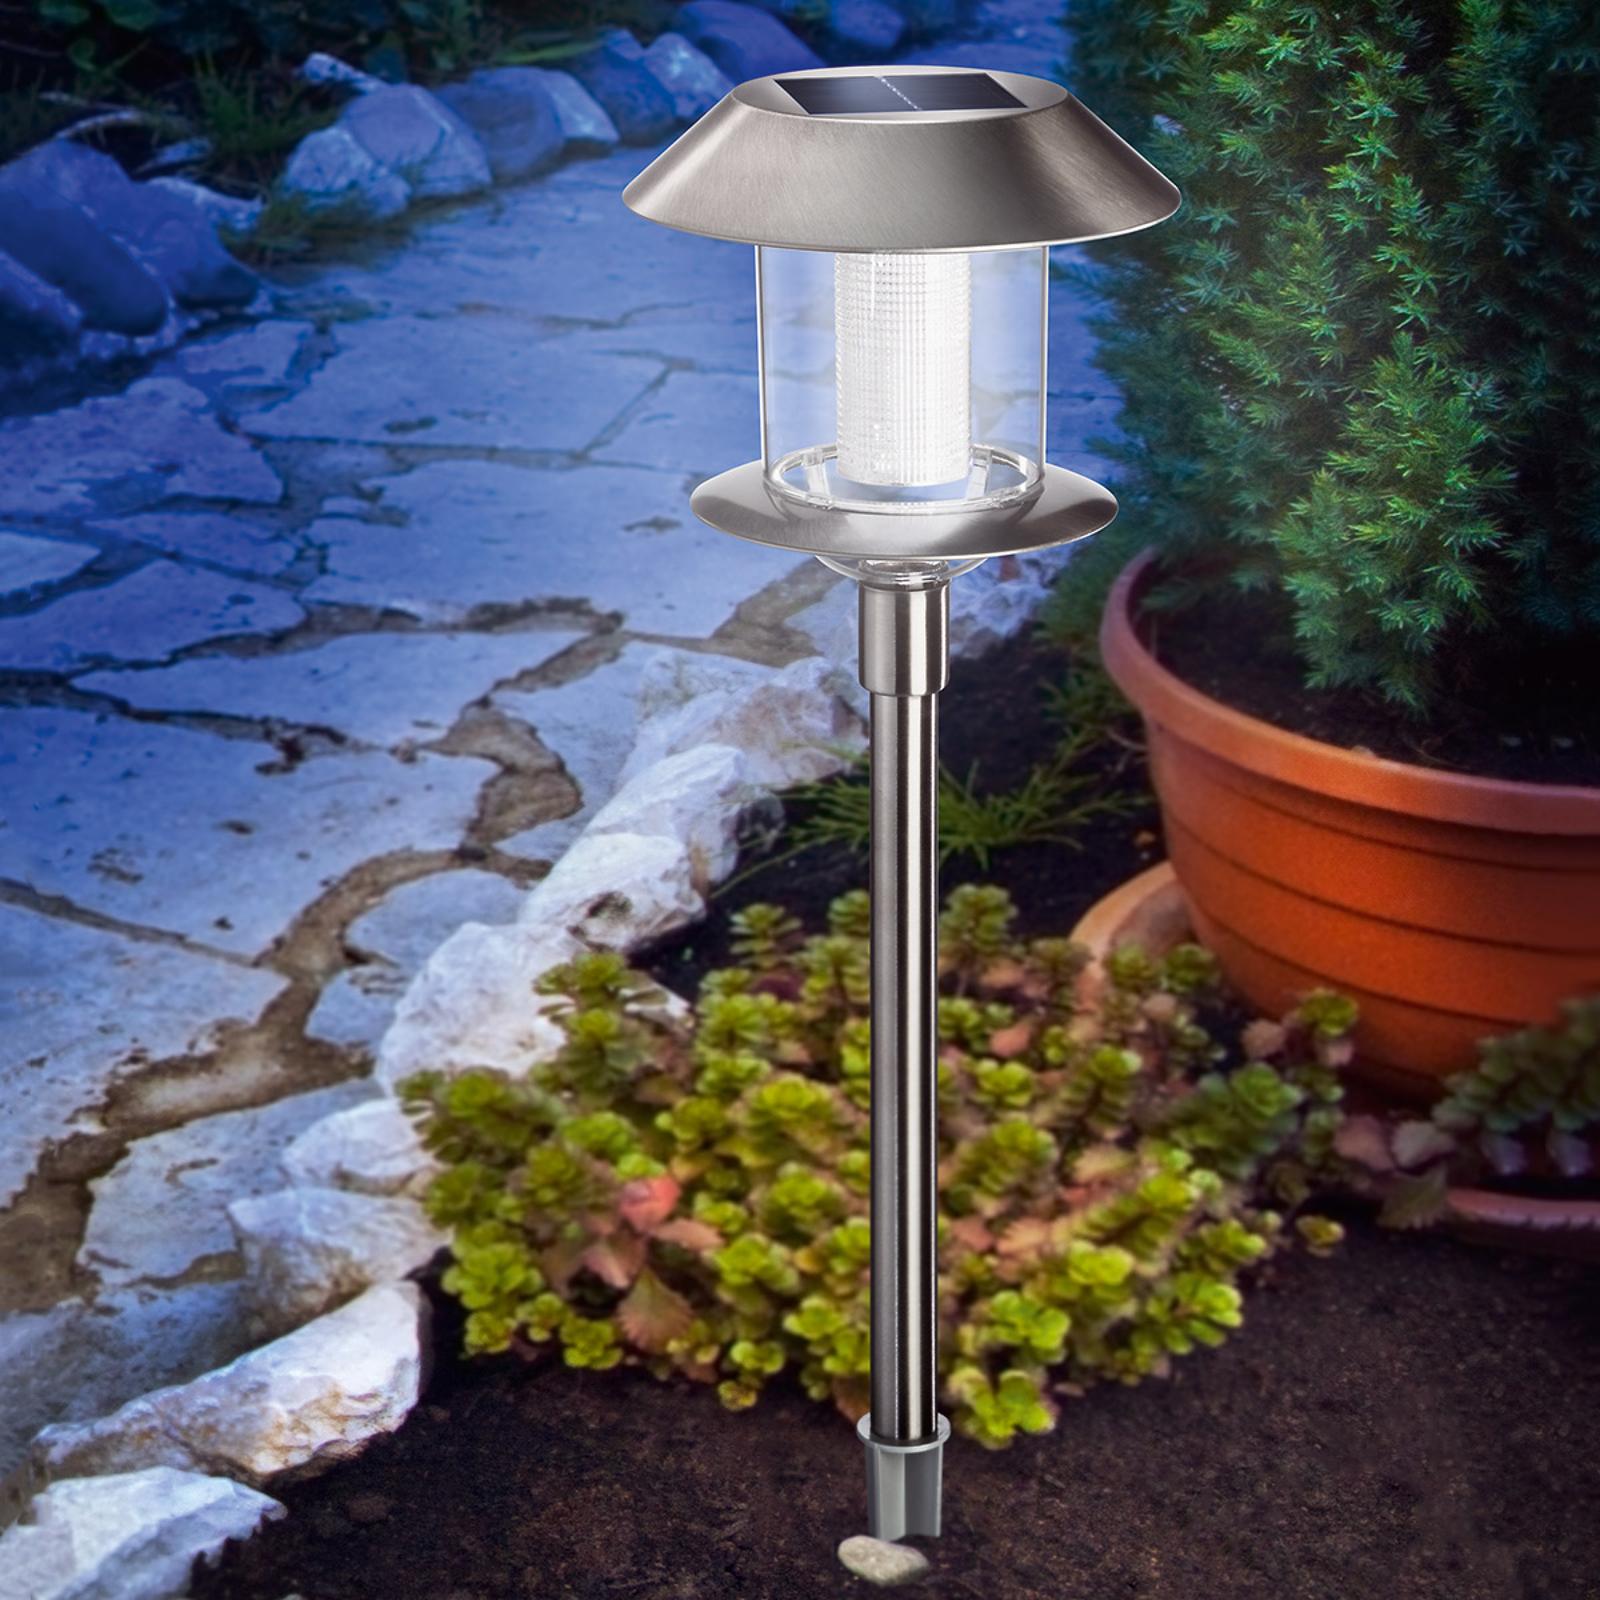 Swing Duo Solar - solcellelampe i rustfrit stål